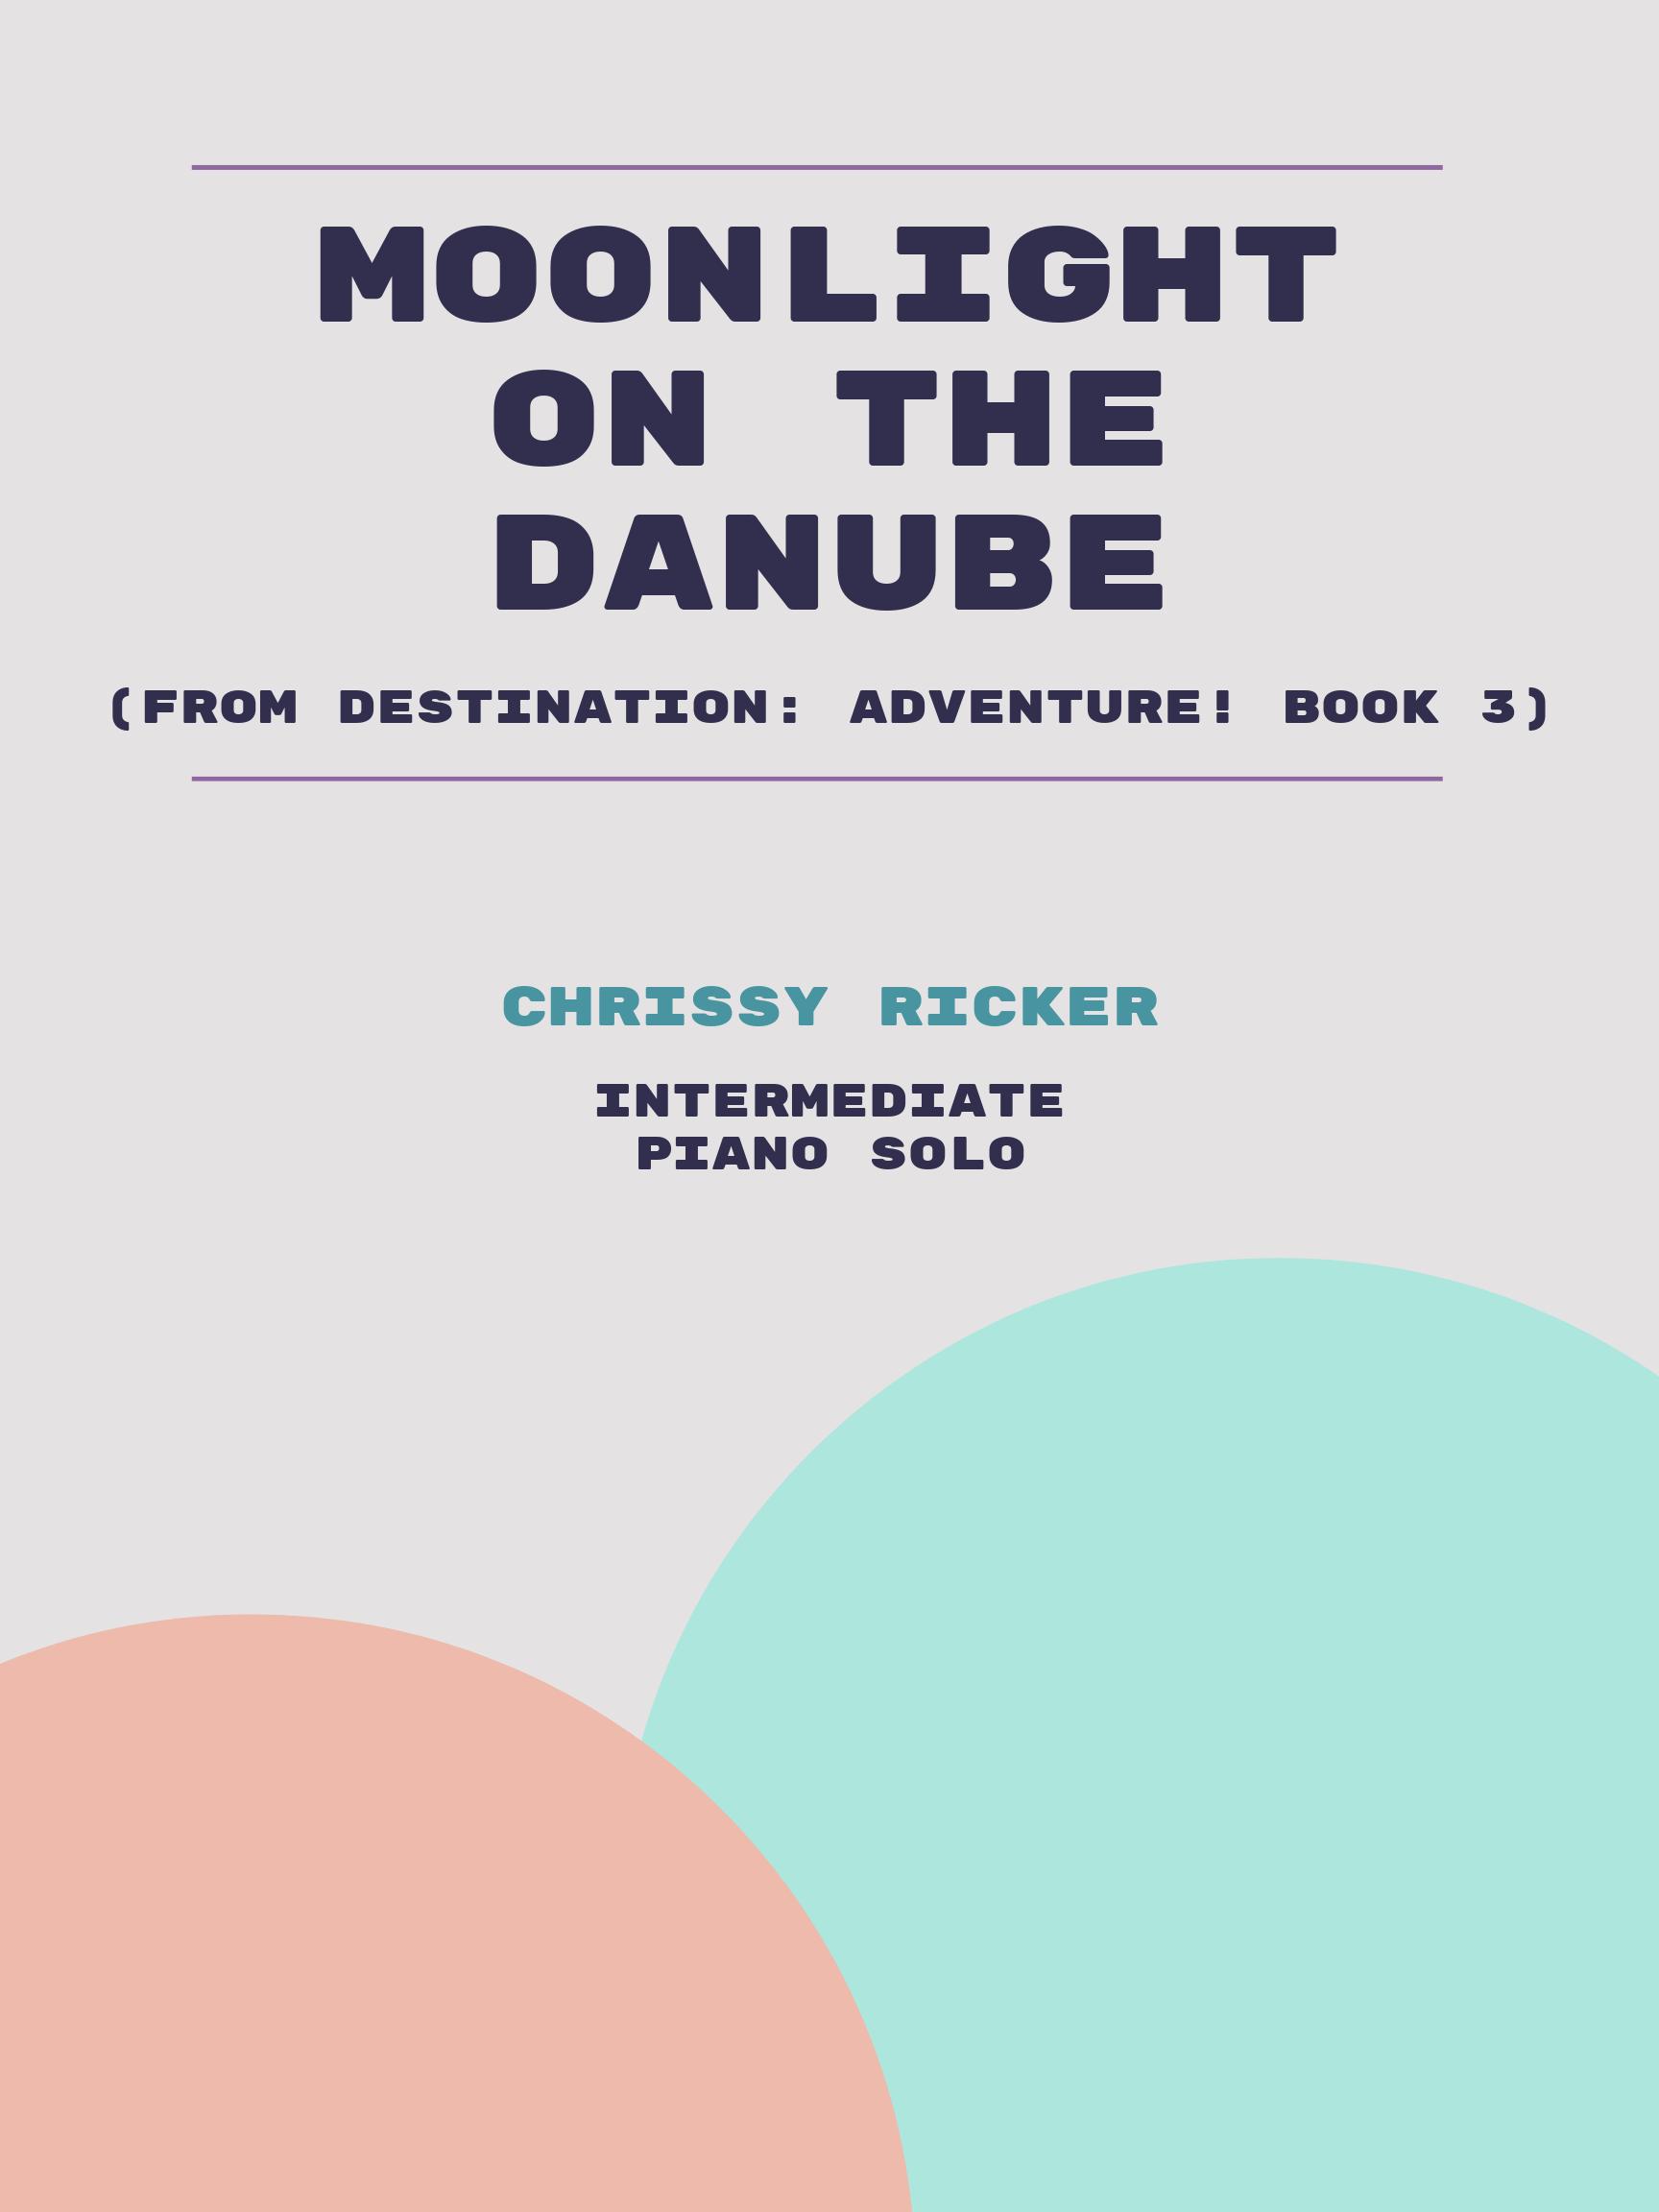 Moonlight on the Danube by Chrissy Ricker